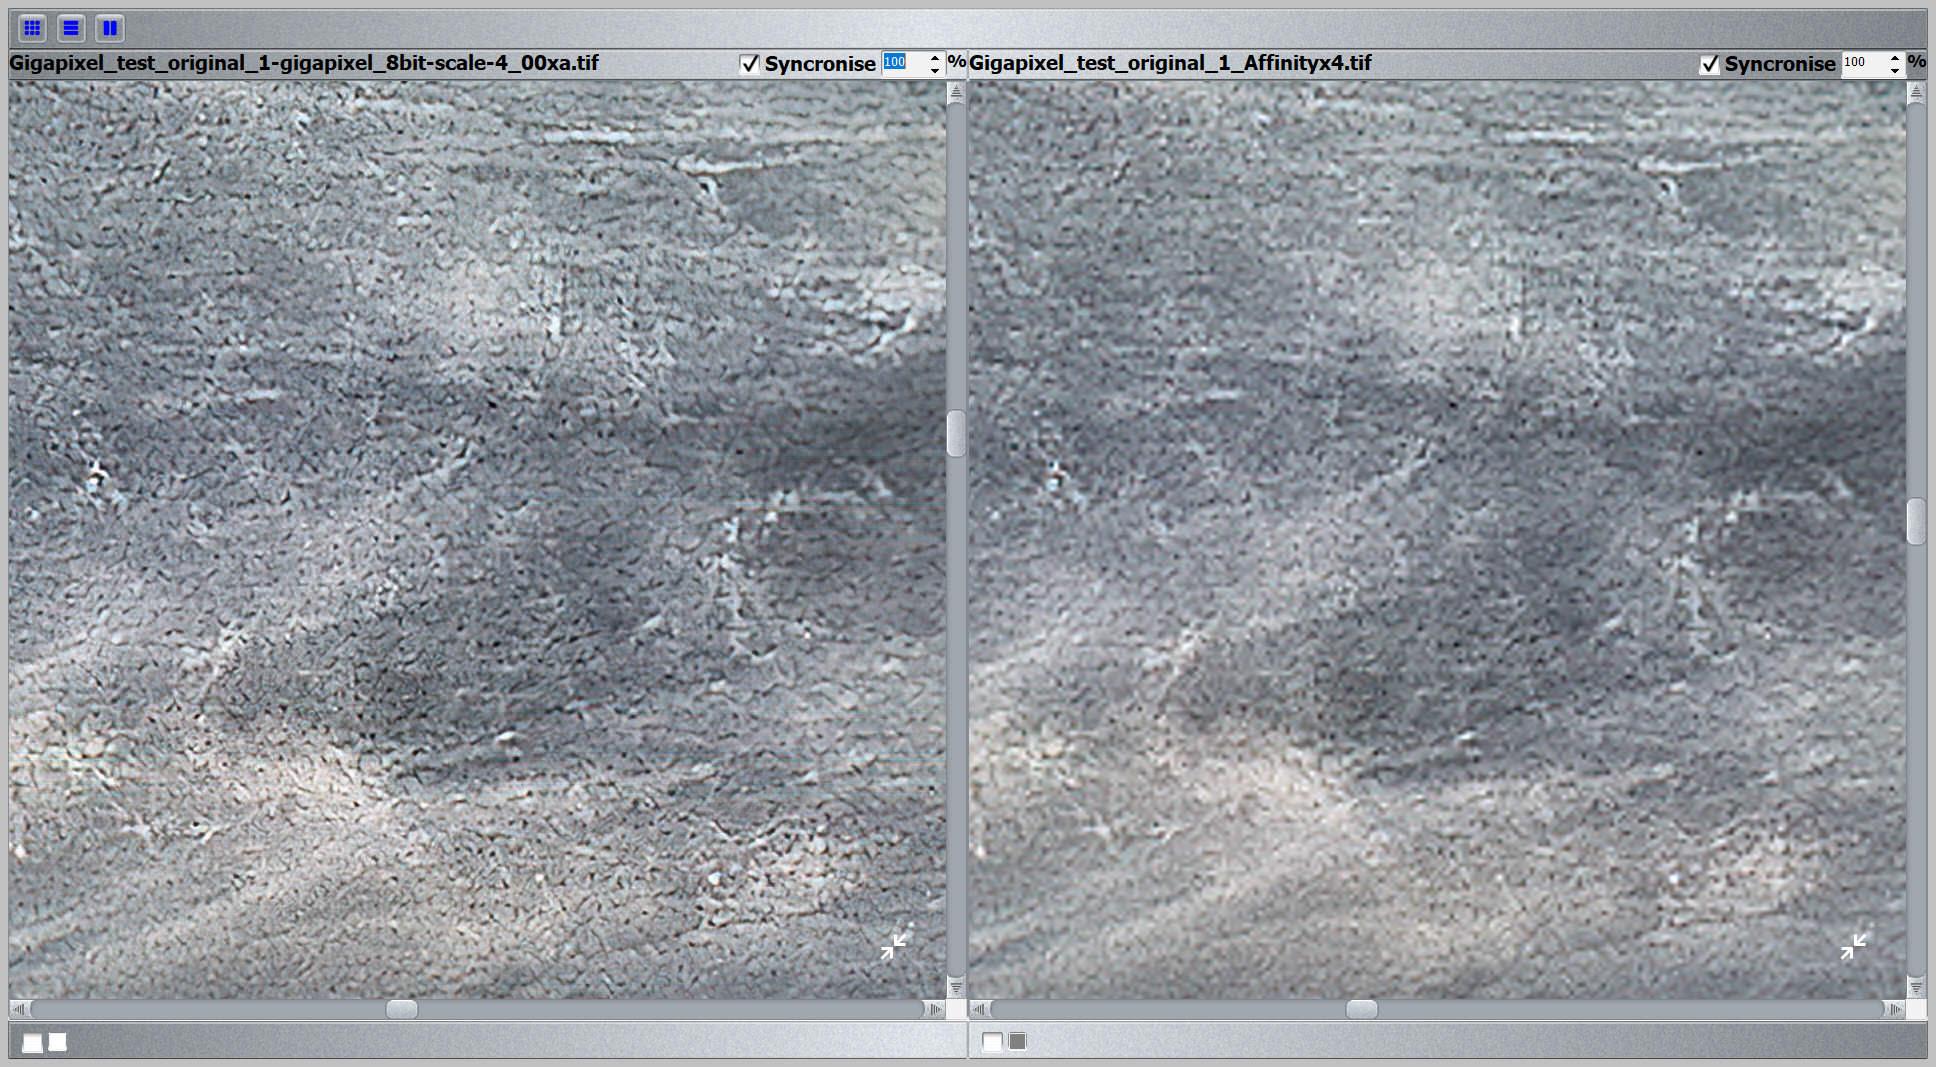 Gigapixel vs Bicubic 400% test